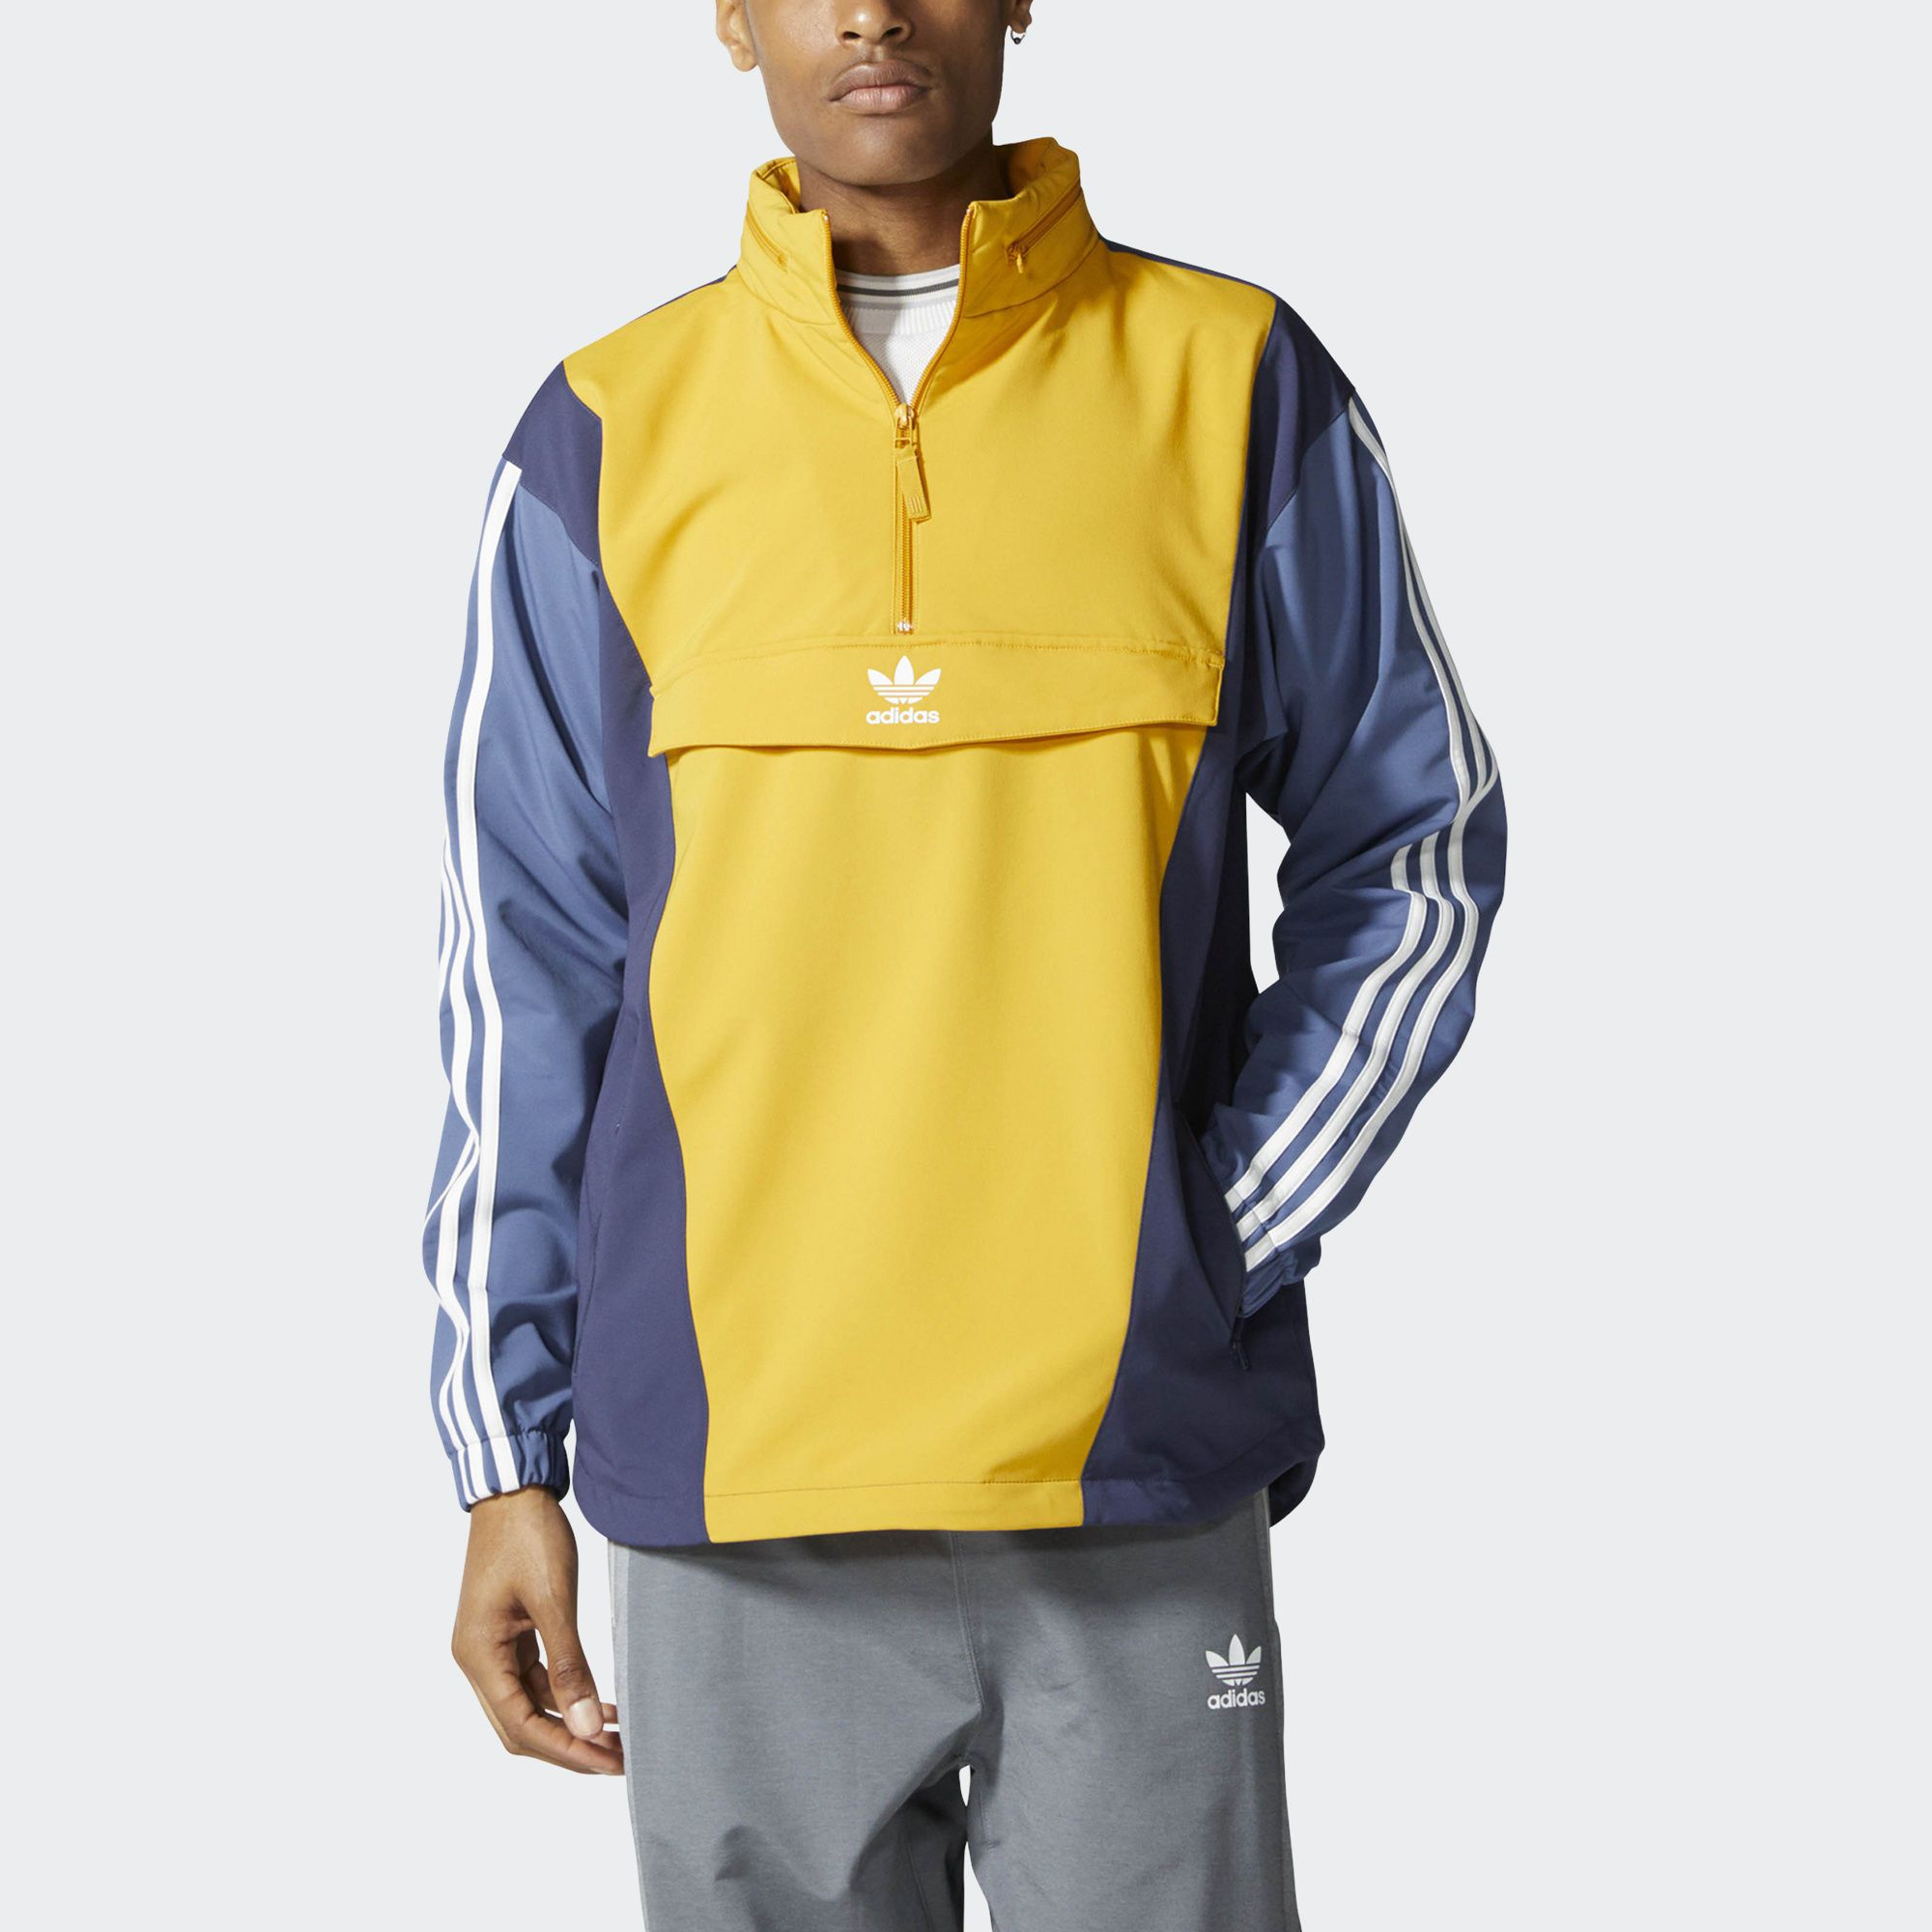 baf7912f Ветровка BLOCKED ANORAK adidas Originals | Куртки | Ветровка, Куртка